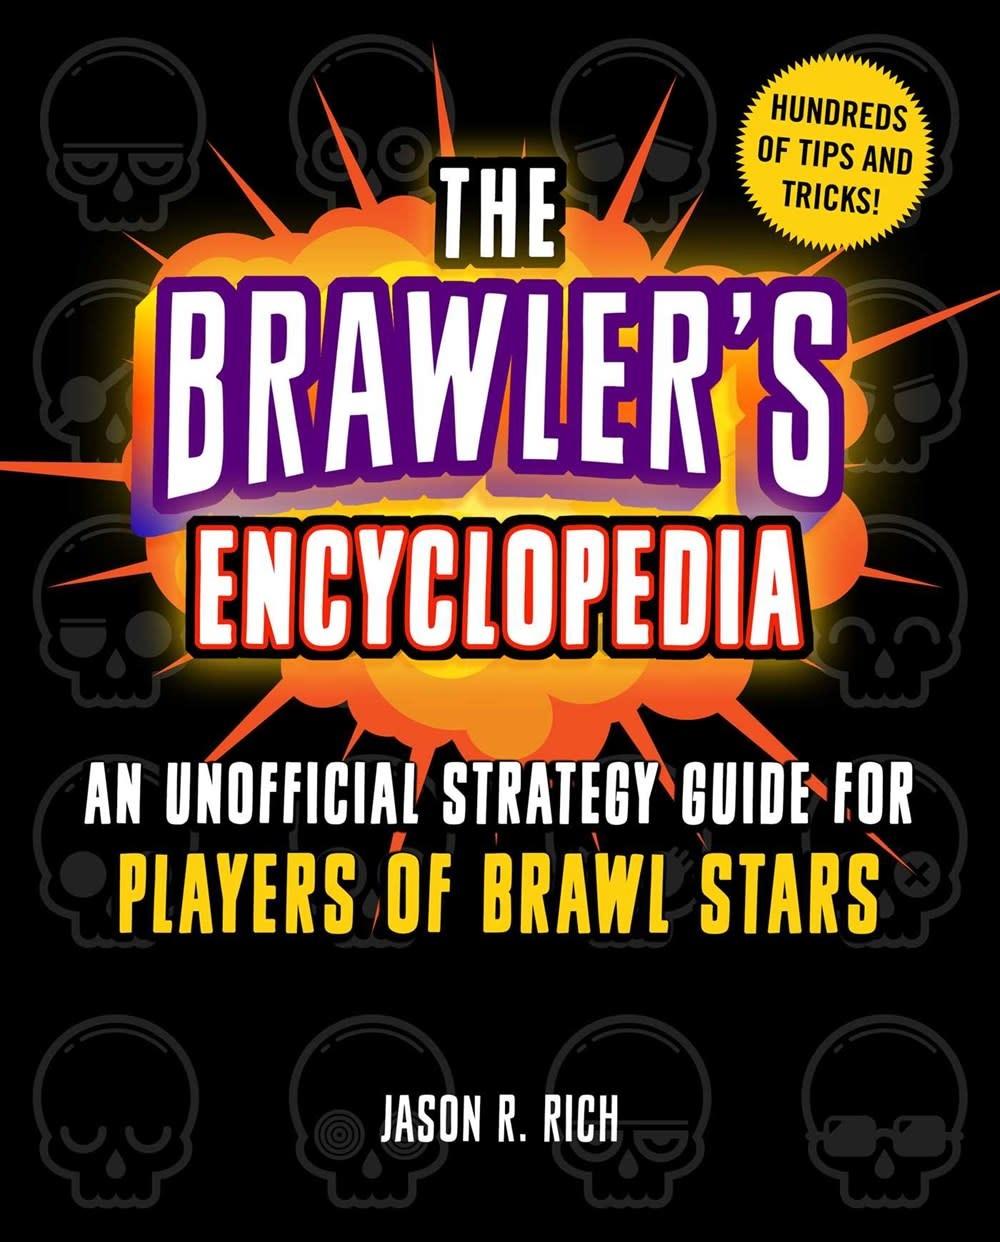 Sky Pony Brawl Stars: The Brawler's Encyclopedia (Unofficial Strategy Guide)